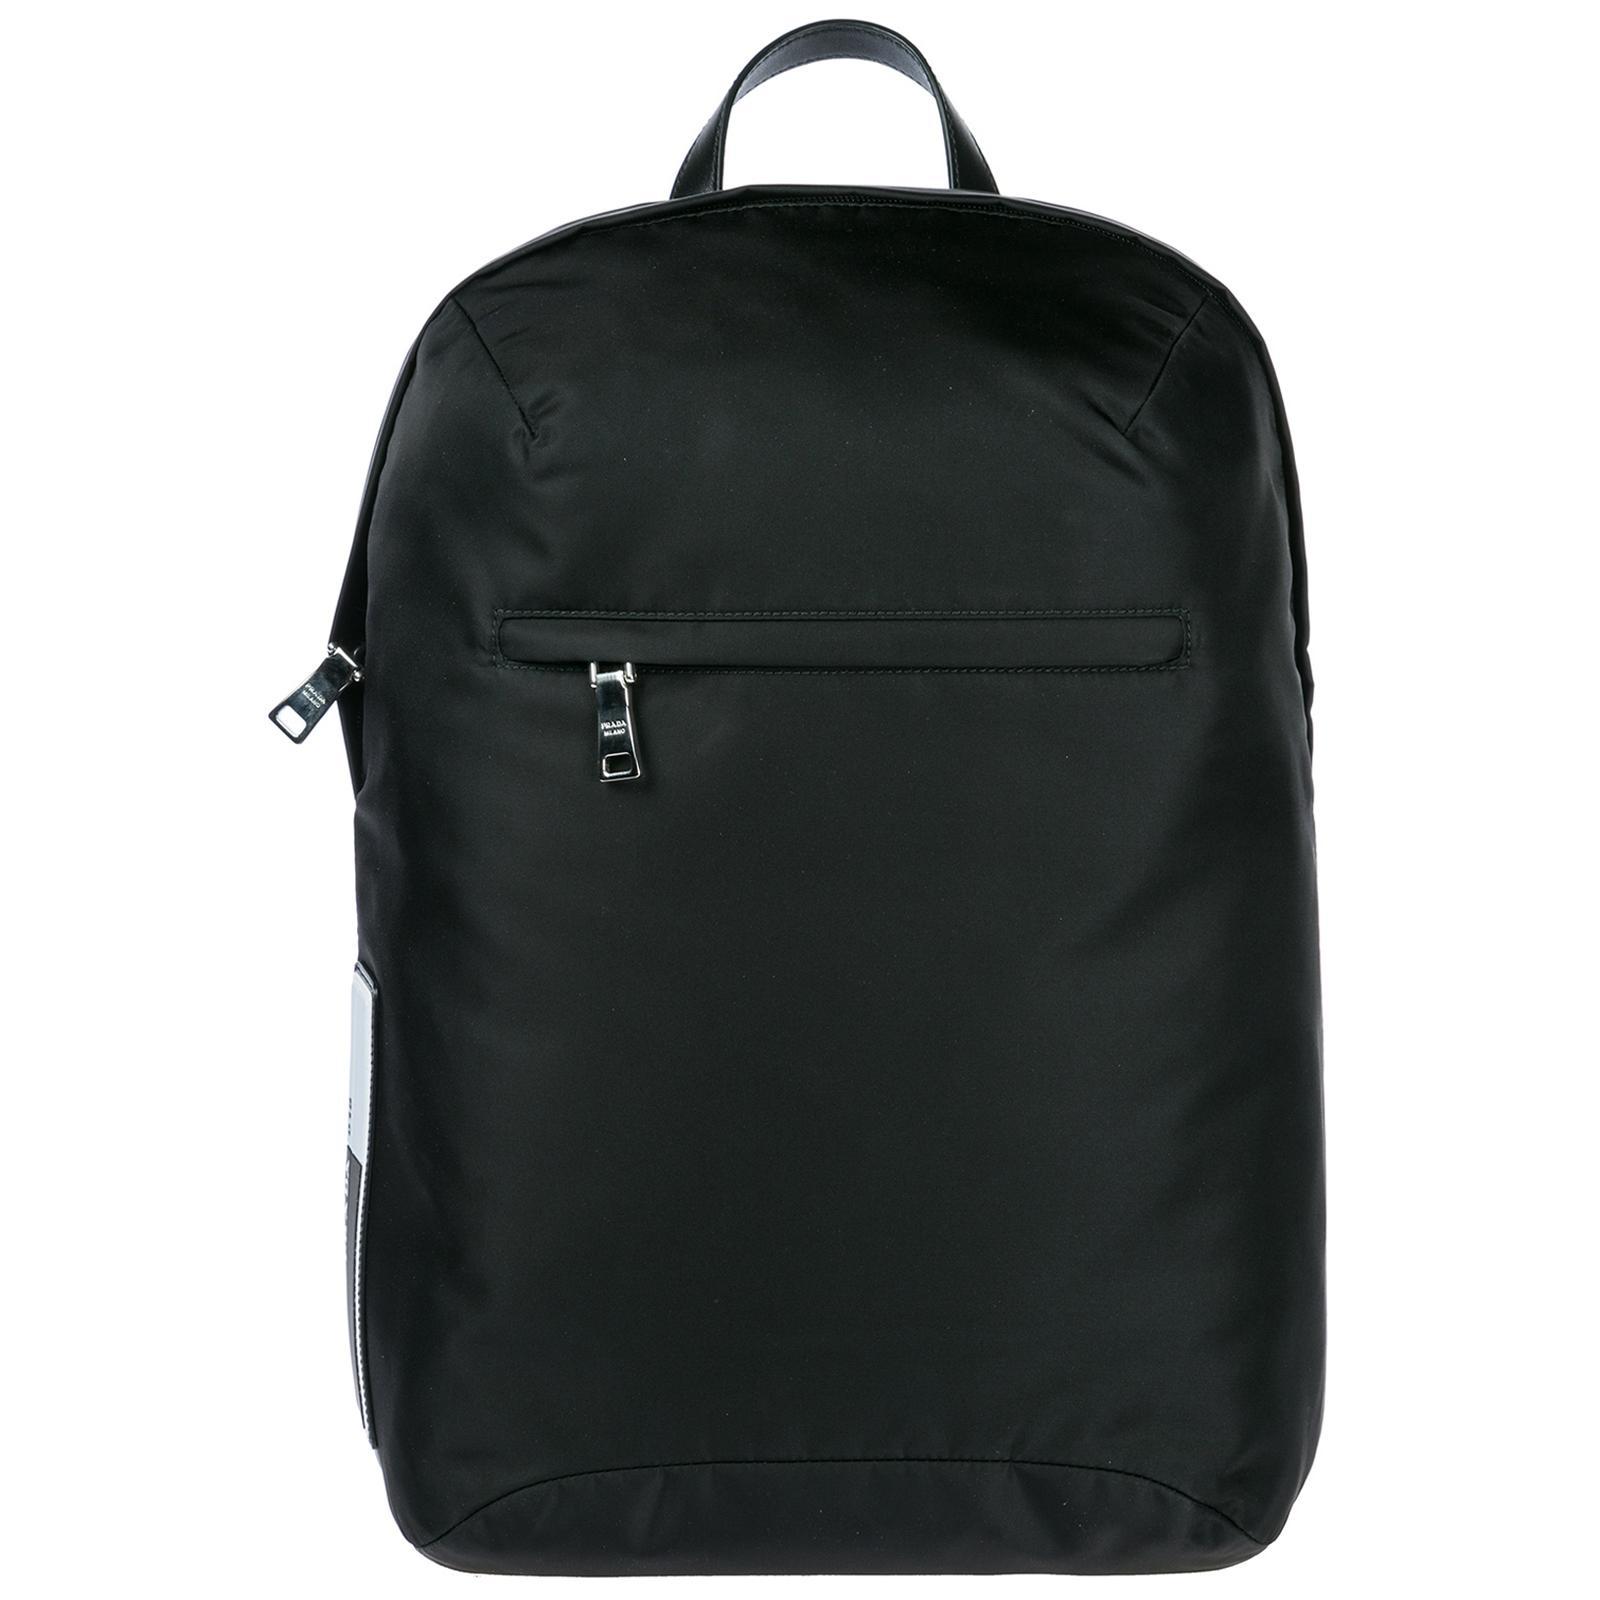 ec5ee2e4b926b Prada Nylon Rucksack Herren Tasche Laptop Schulrucksack In Black ...